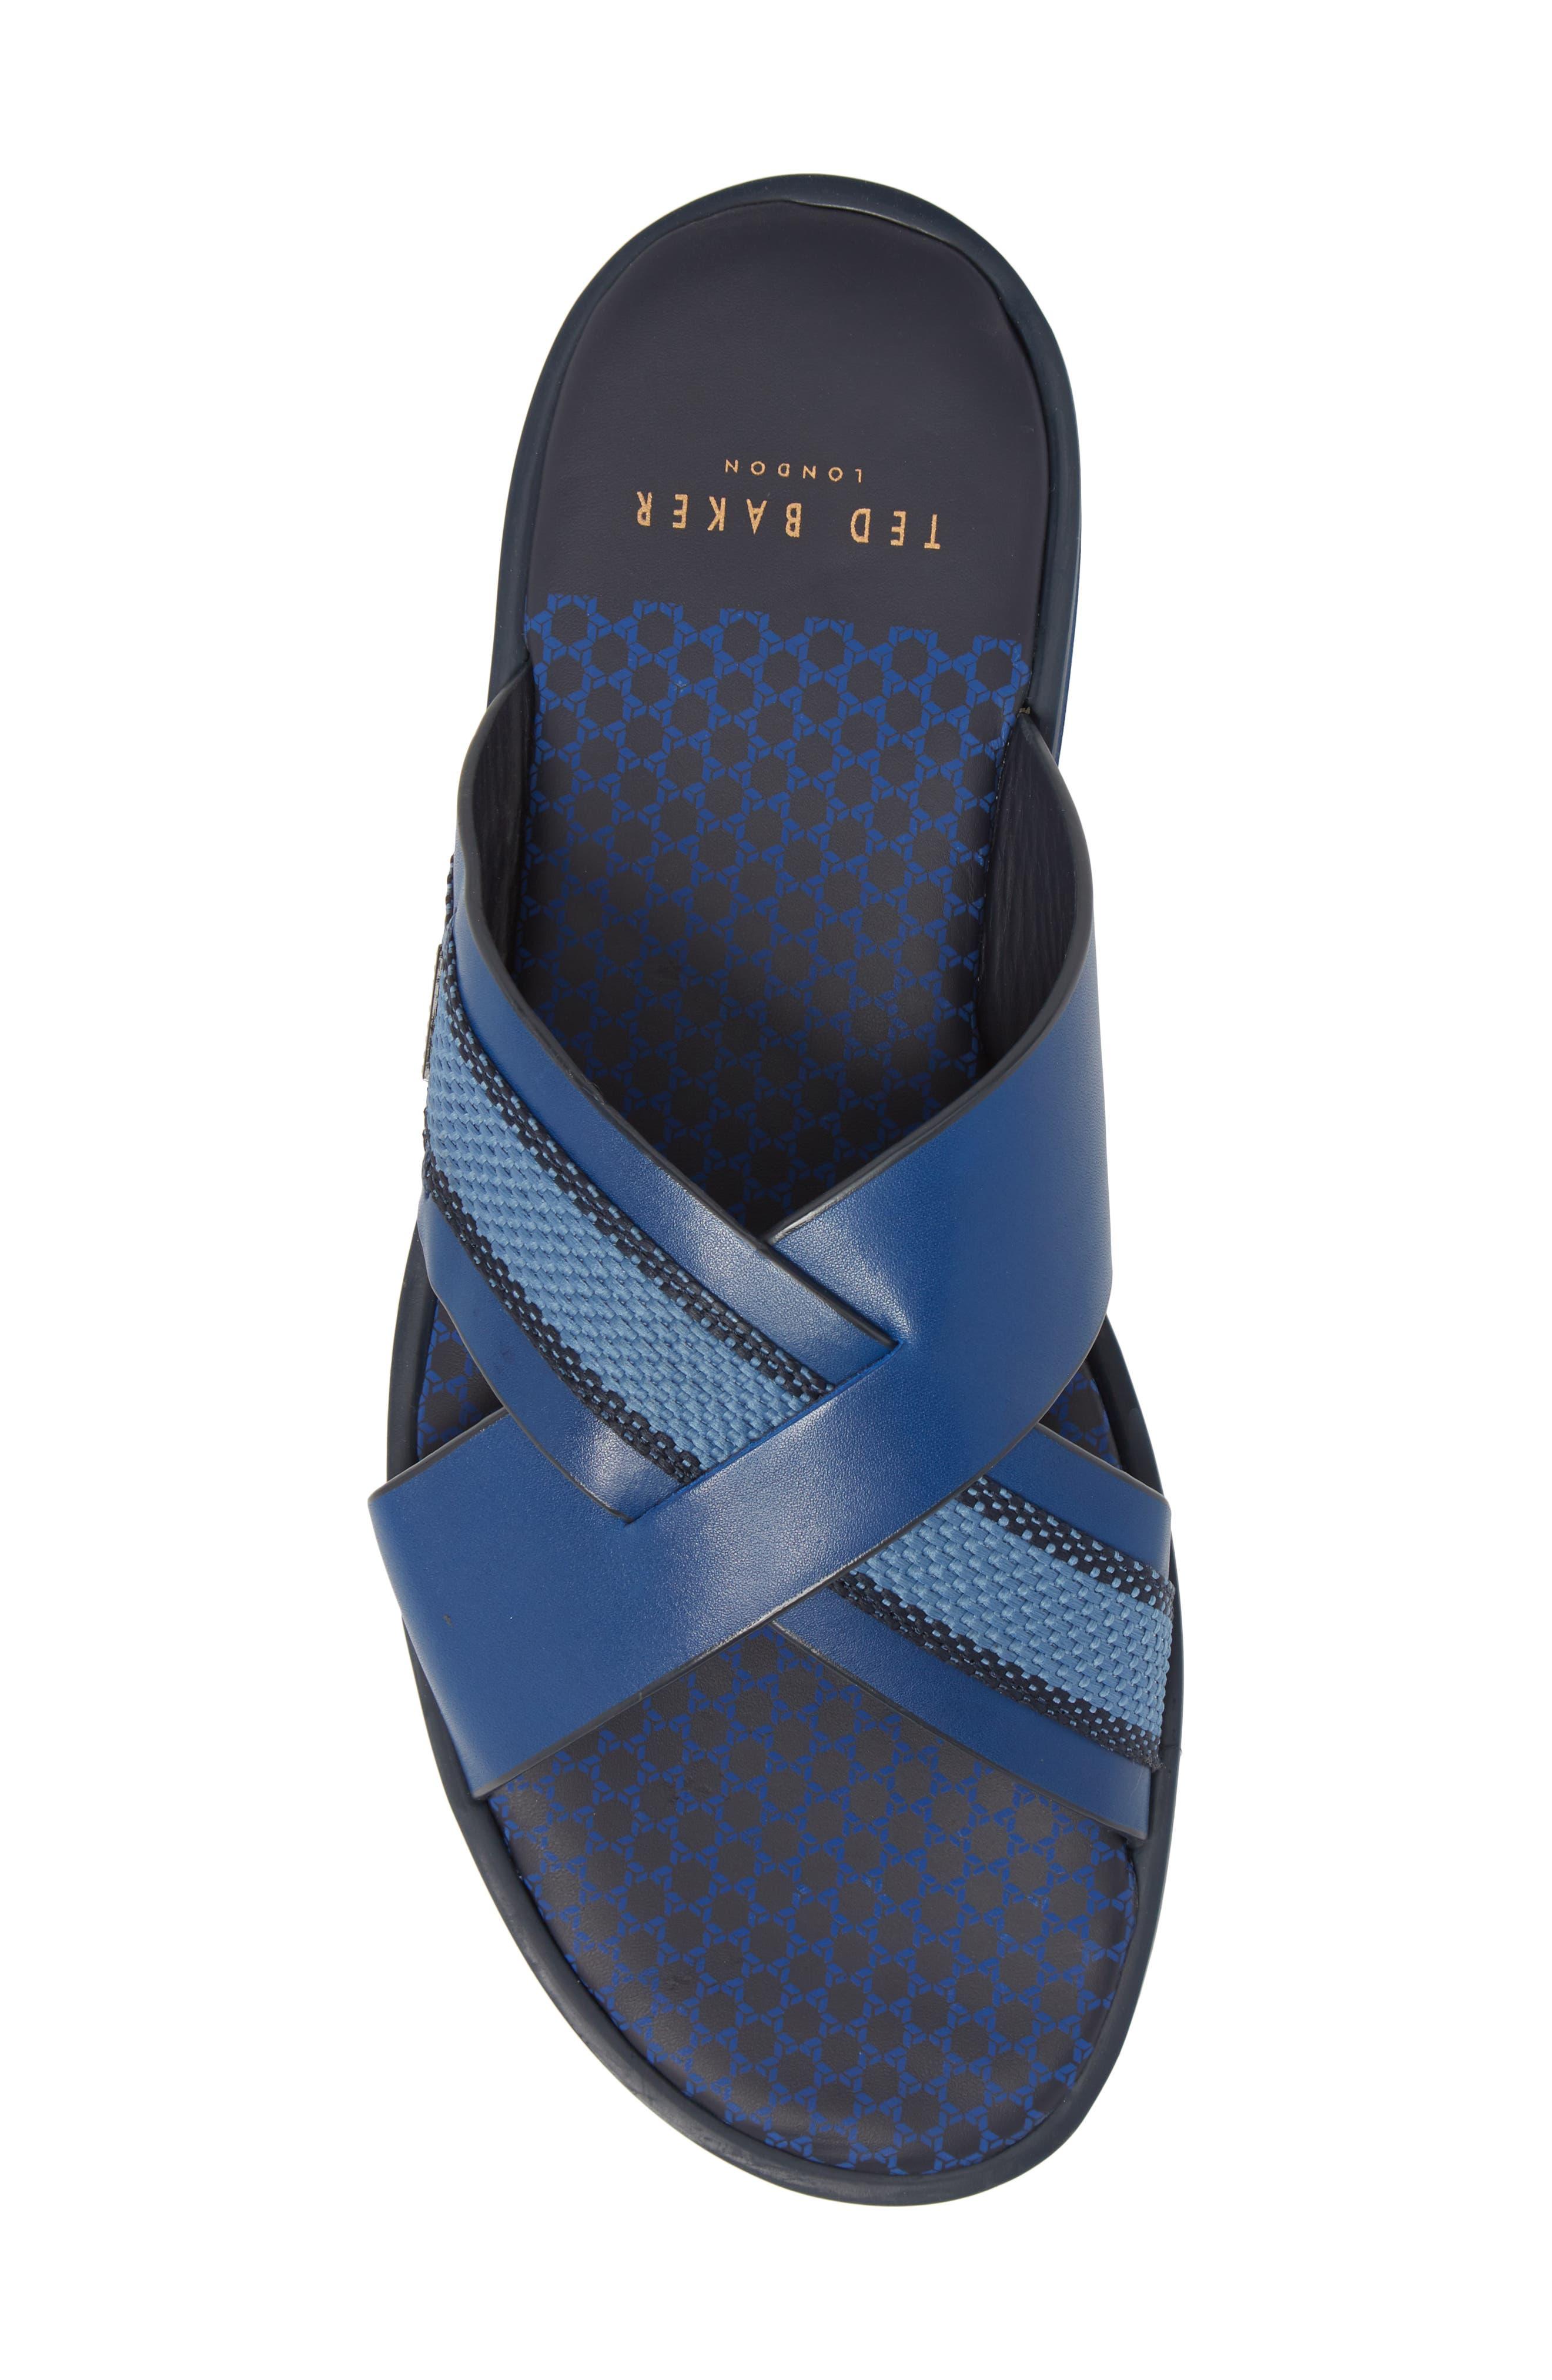 Farrull Cross Strap Slide Sandal,                             Alternate thumbnail 5, color,                             BLUE LEATHER/TEXTILE